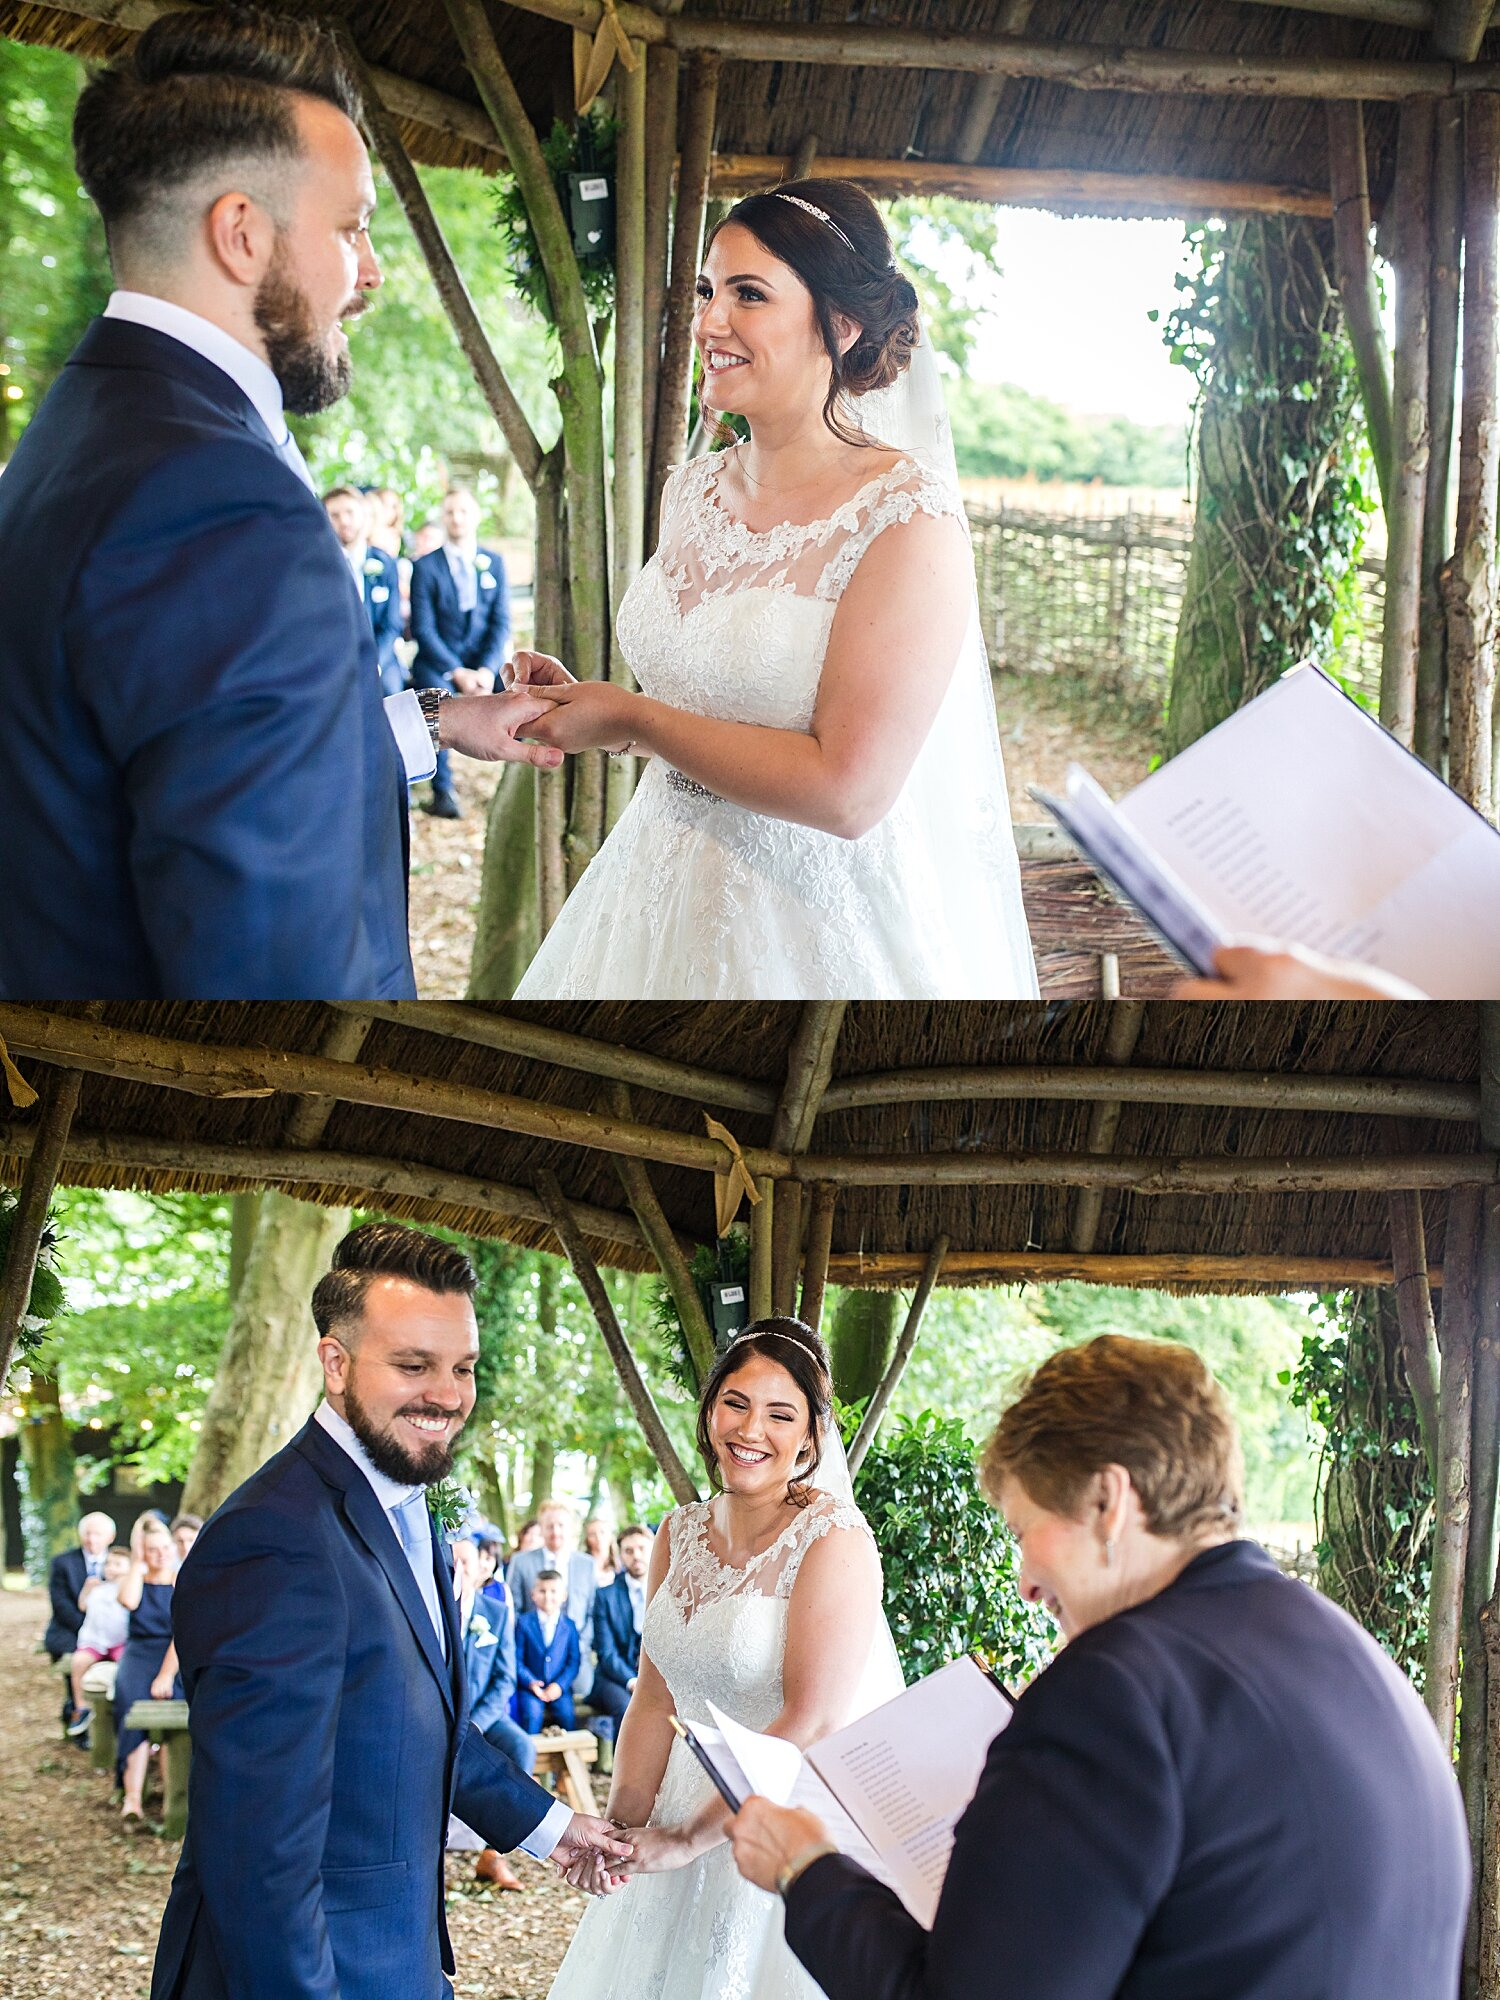 The BarnYard - Kent Wedding Photographer - Carla Guest Photography_0029.jpg